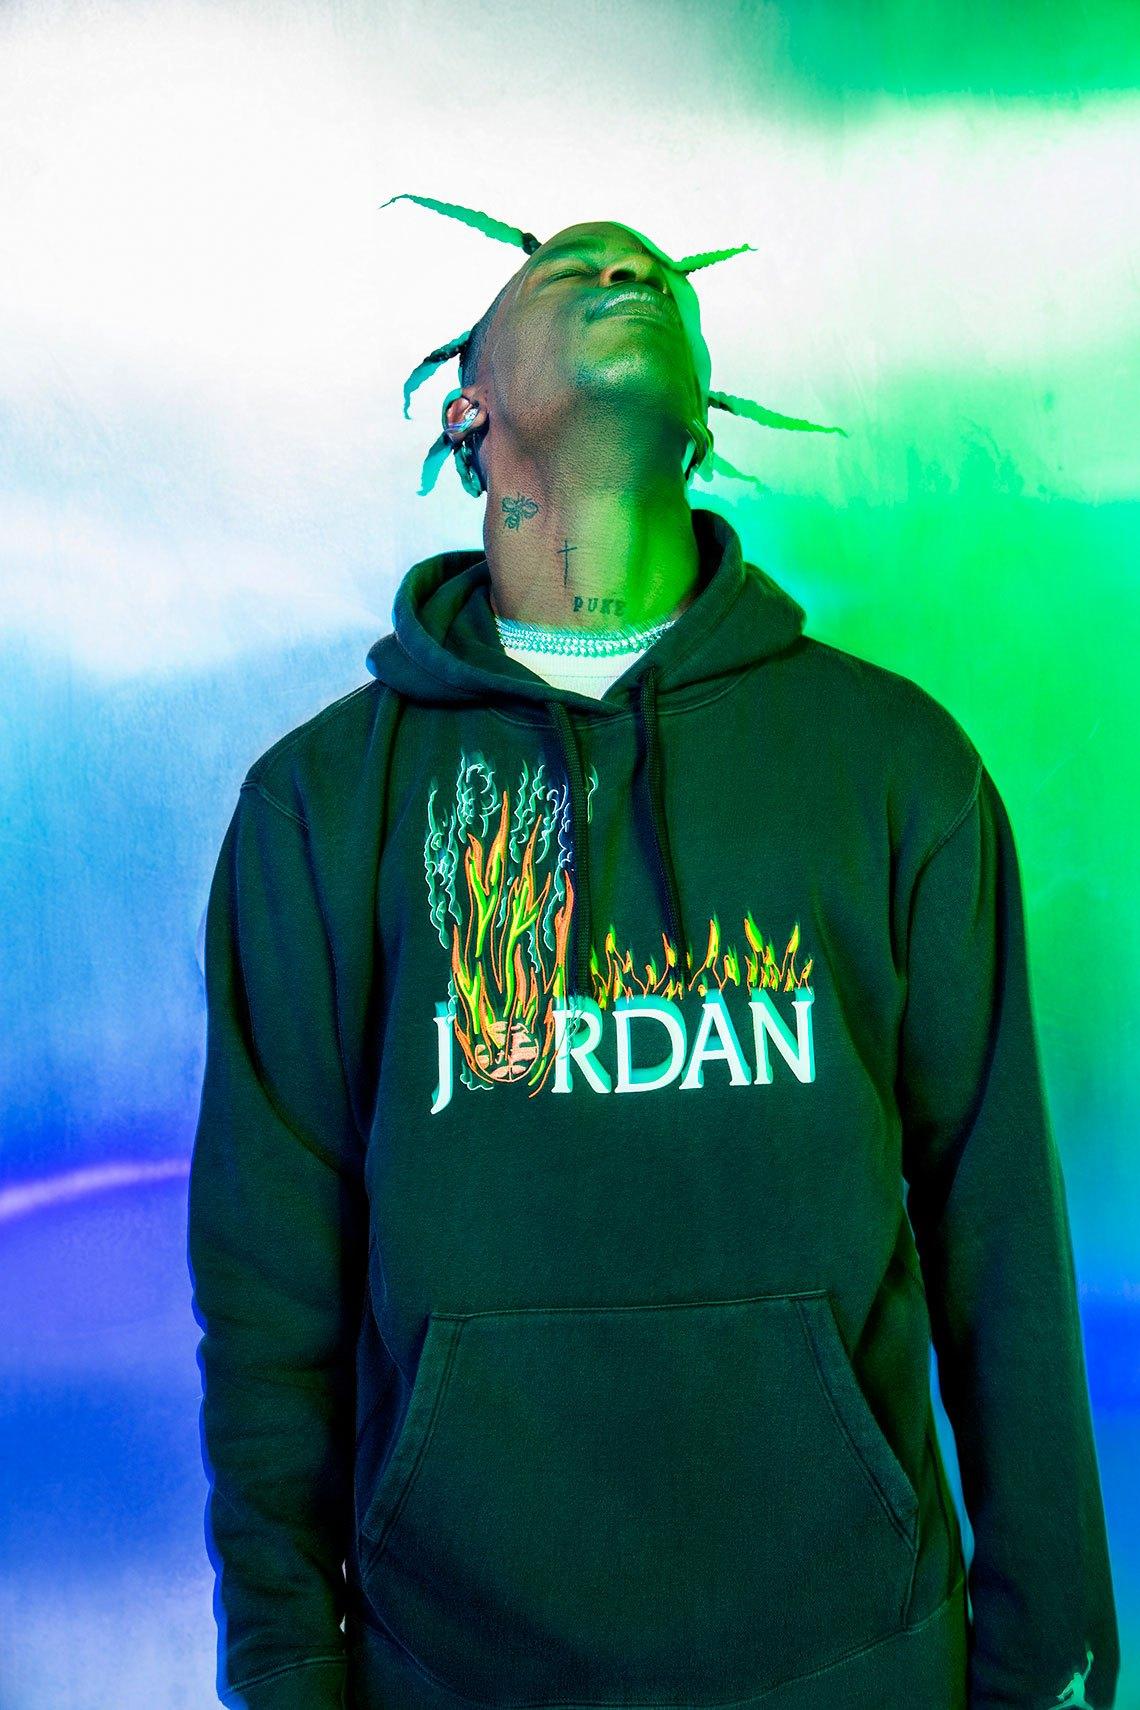 28f183010ab5f7 The full Travis Scott x Air Jordan 1 collection drops on Saturday (May 11)